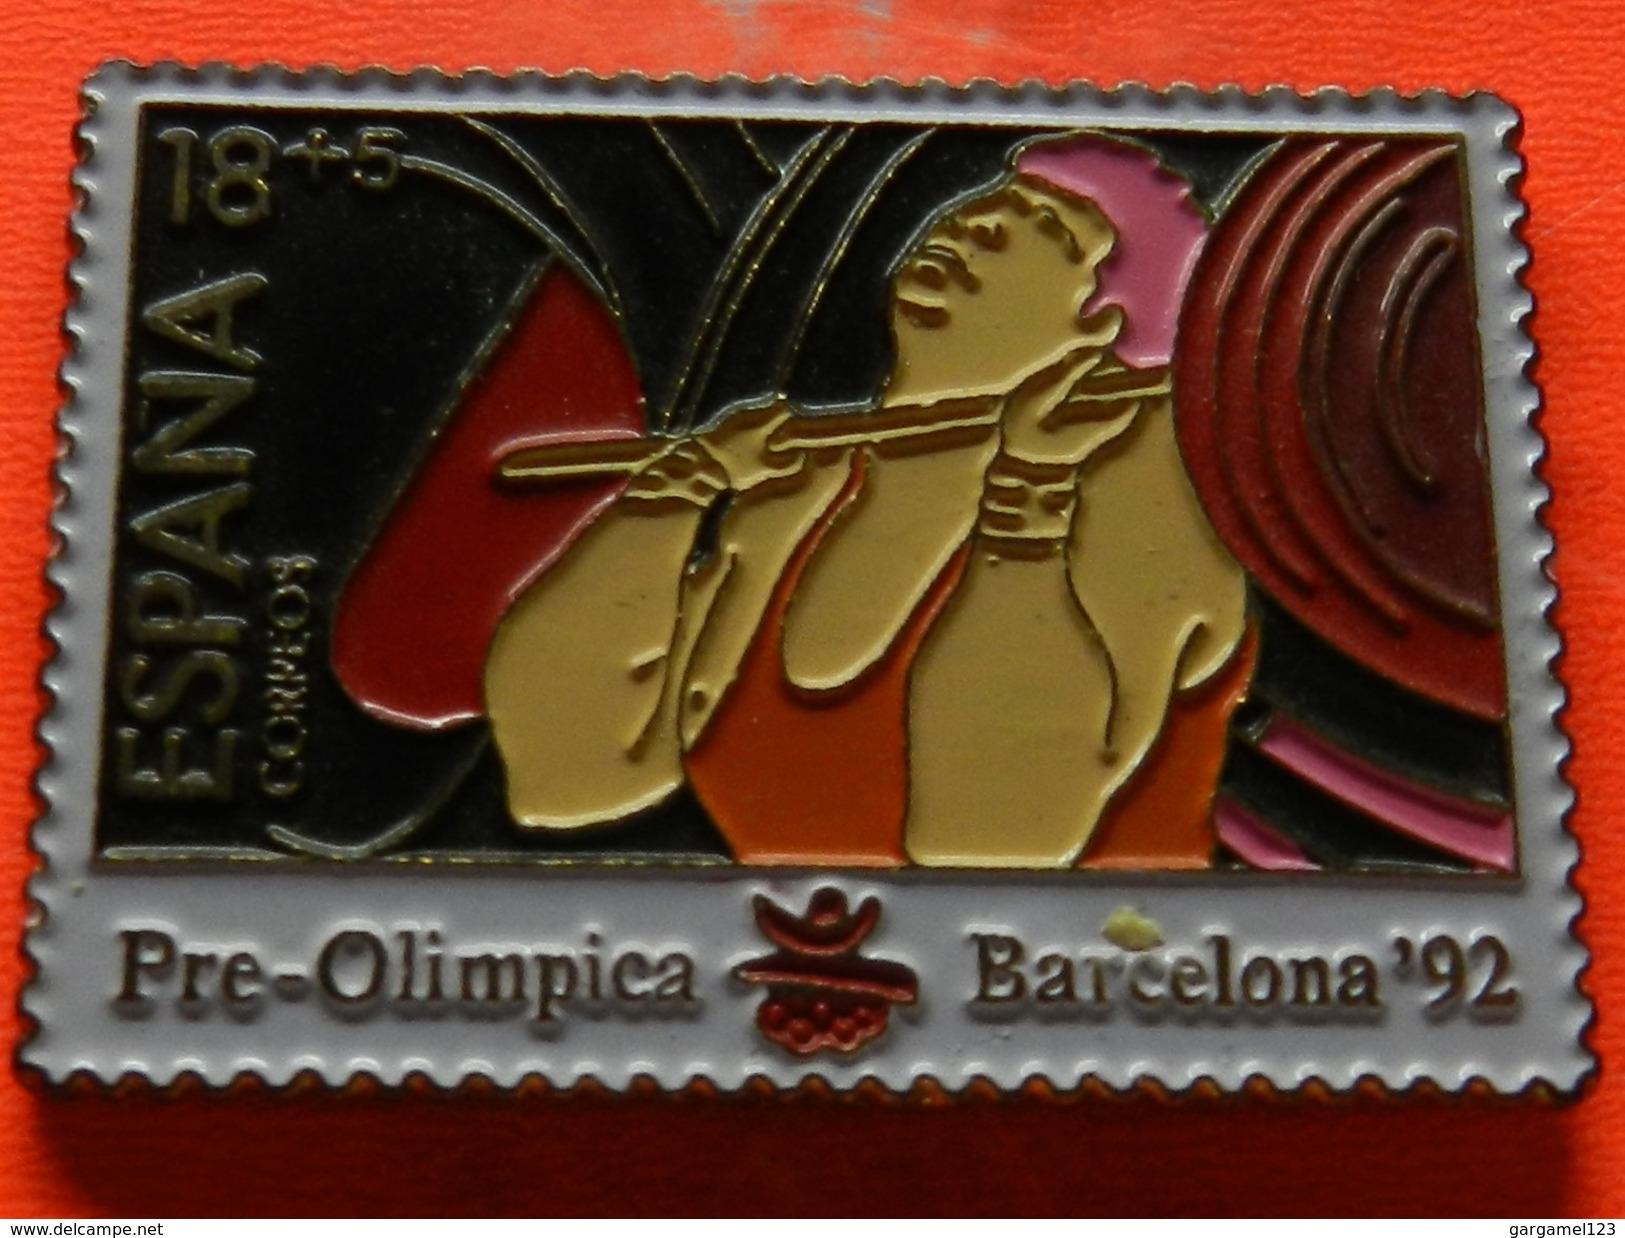 PRE OLIMPICO HALTEROFILIA - Weightlifting